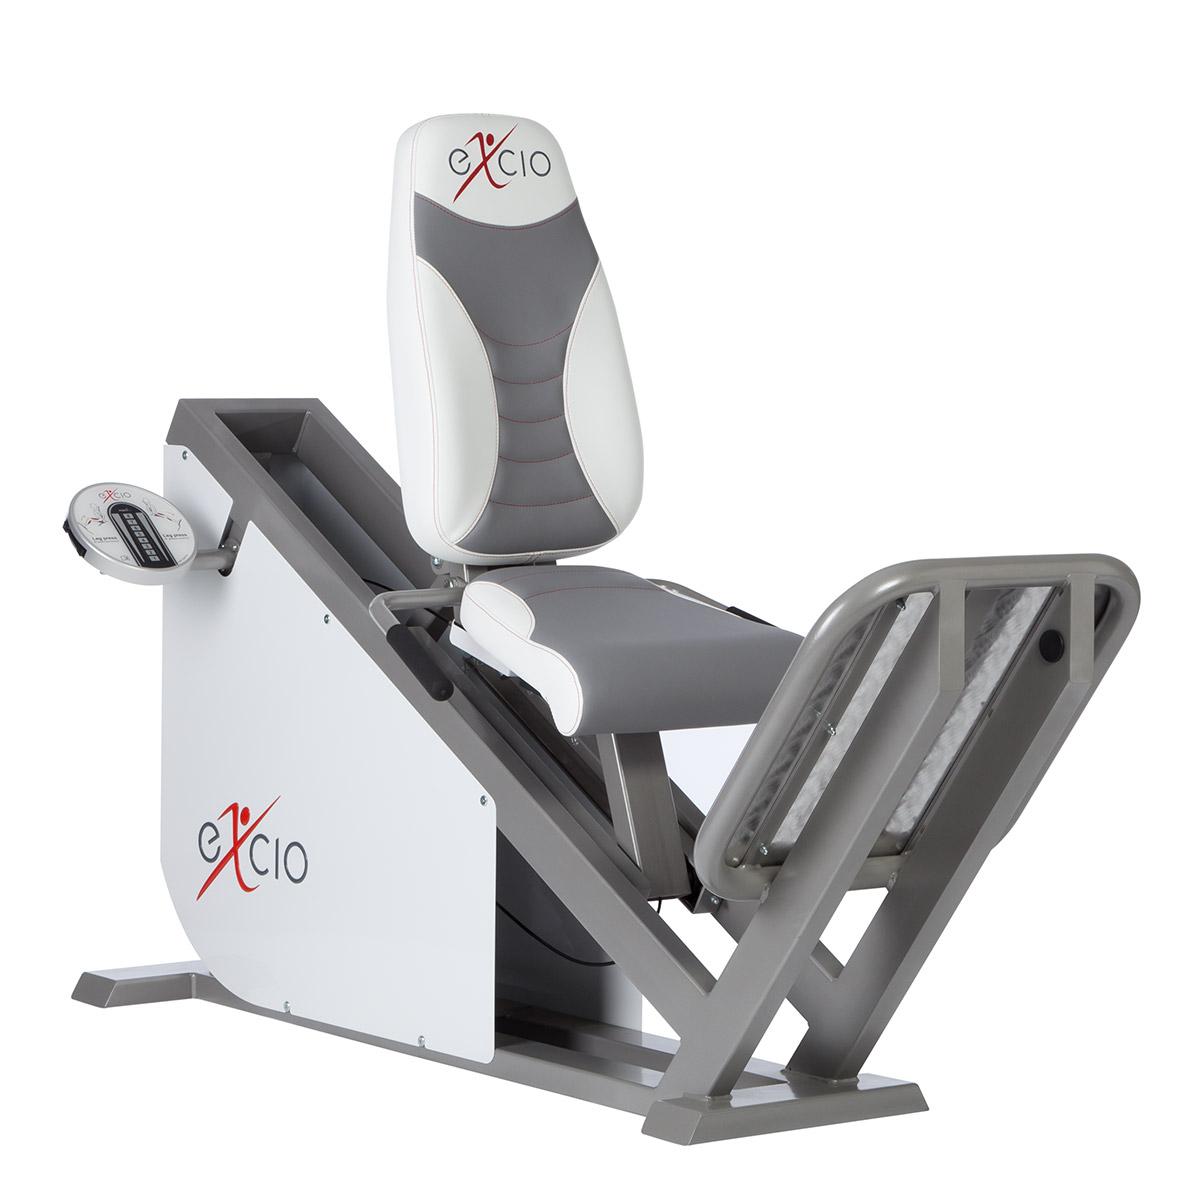 excio-Trainingsgeräte – hochwertig, innovativ und vielseitig